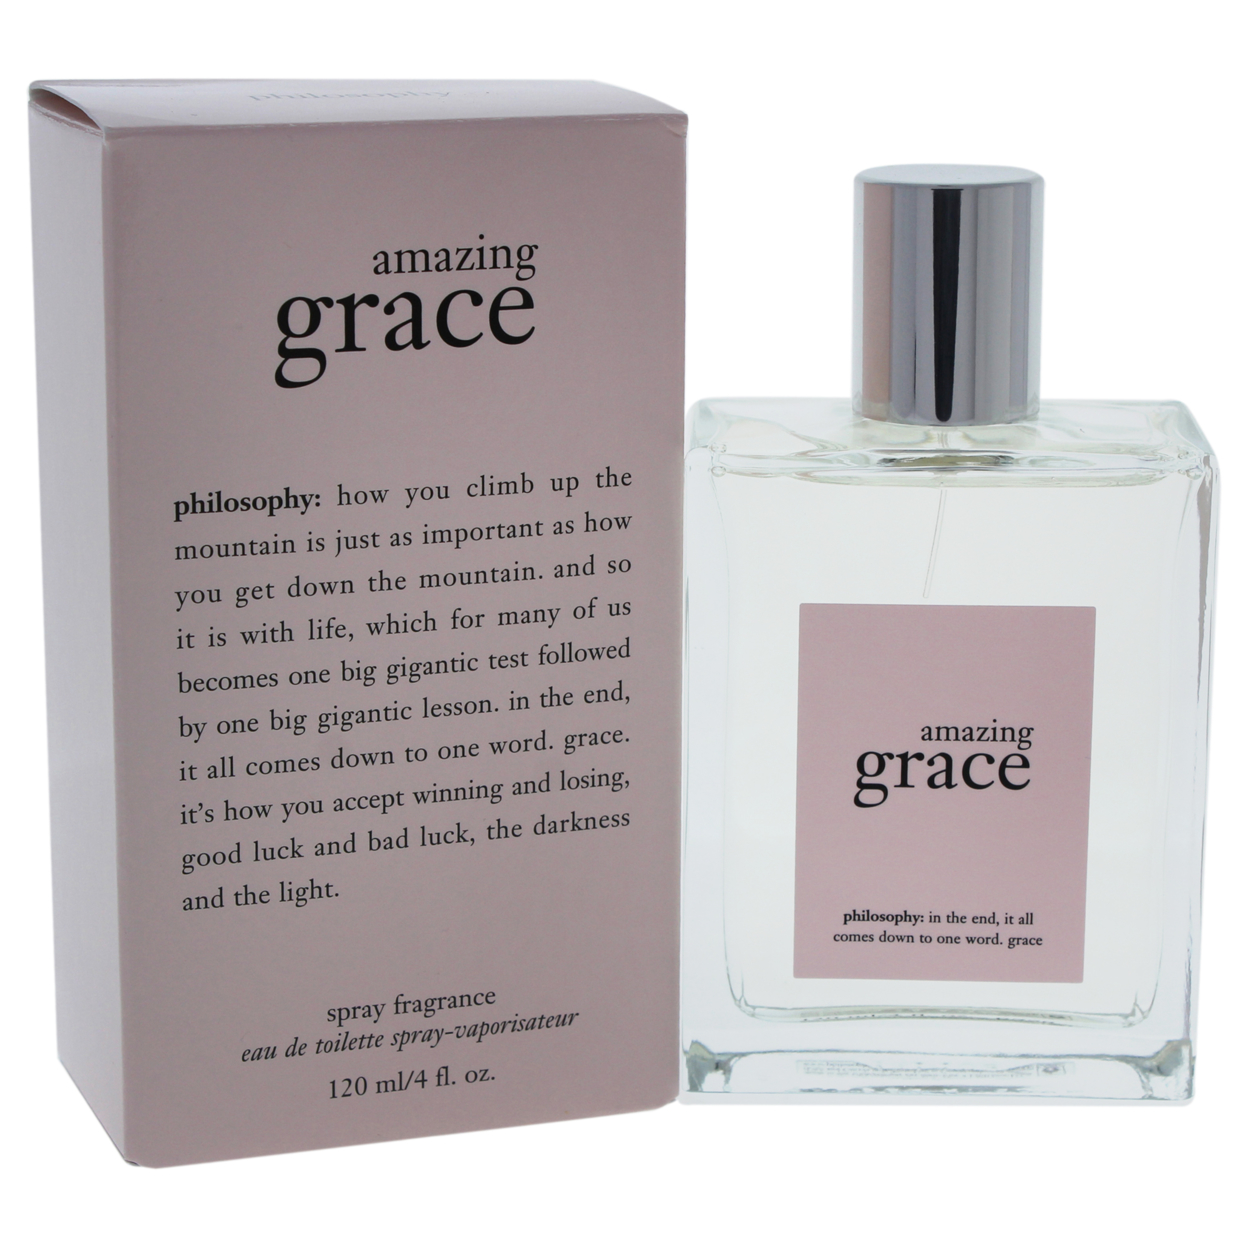 Amazing Grace by Philosophy for Women - 4 oz EDT Spray amazing grace cd